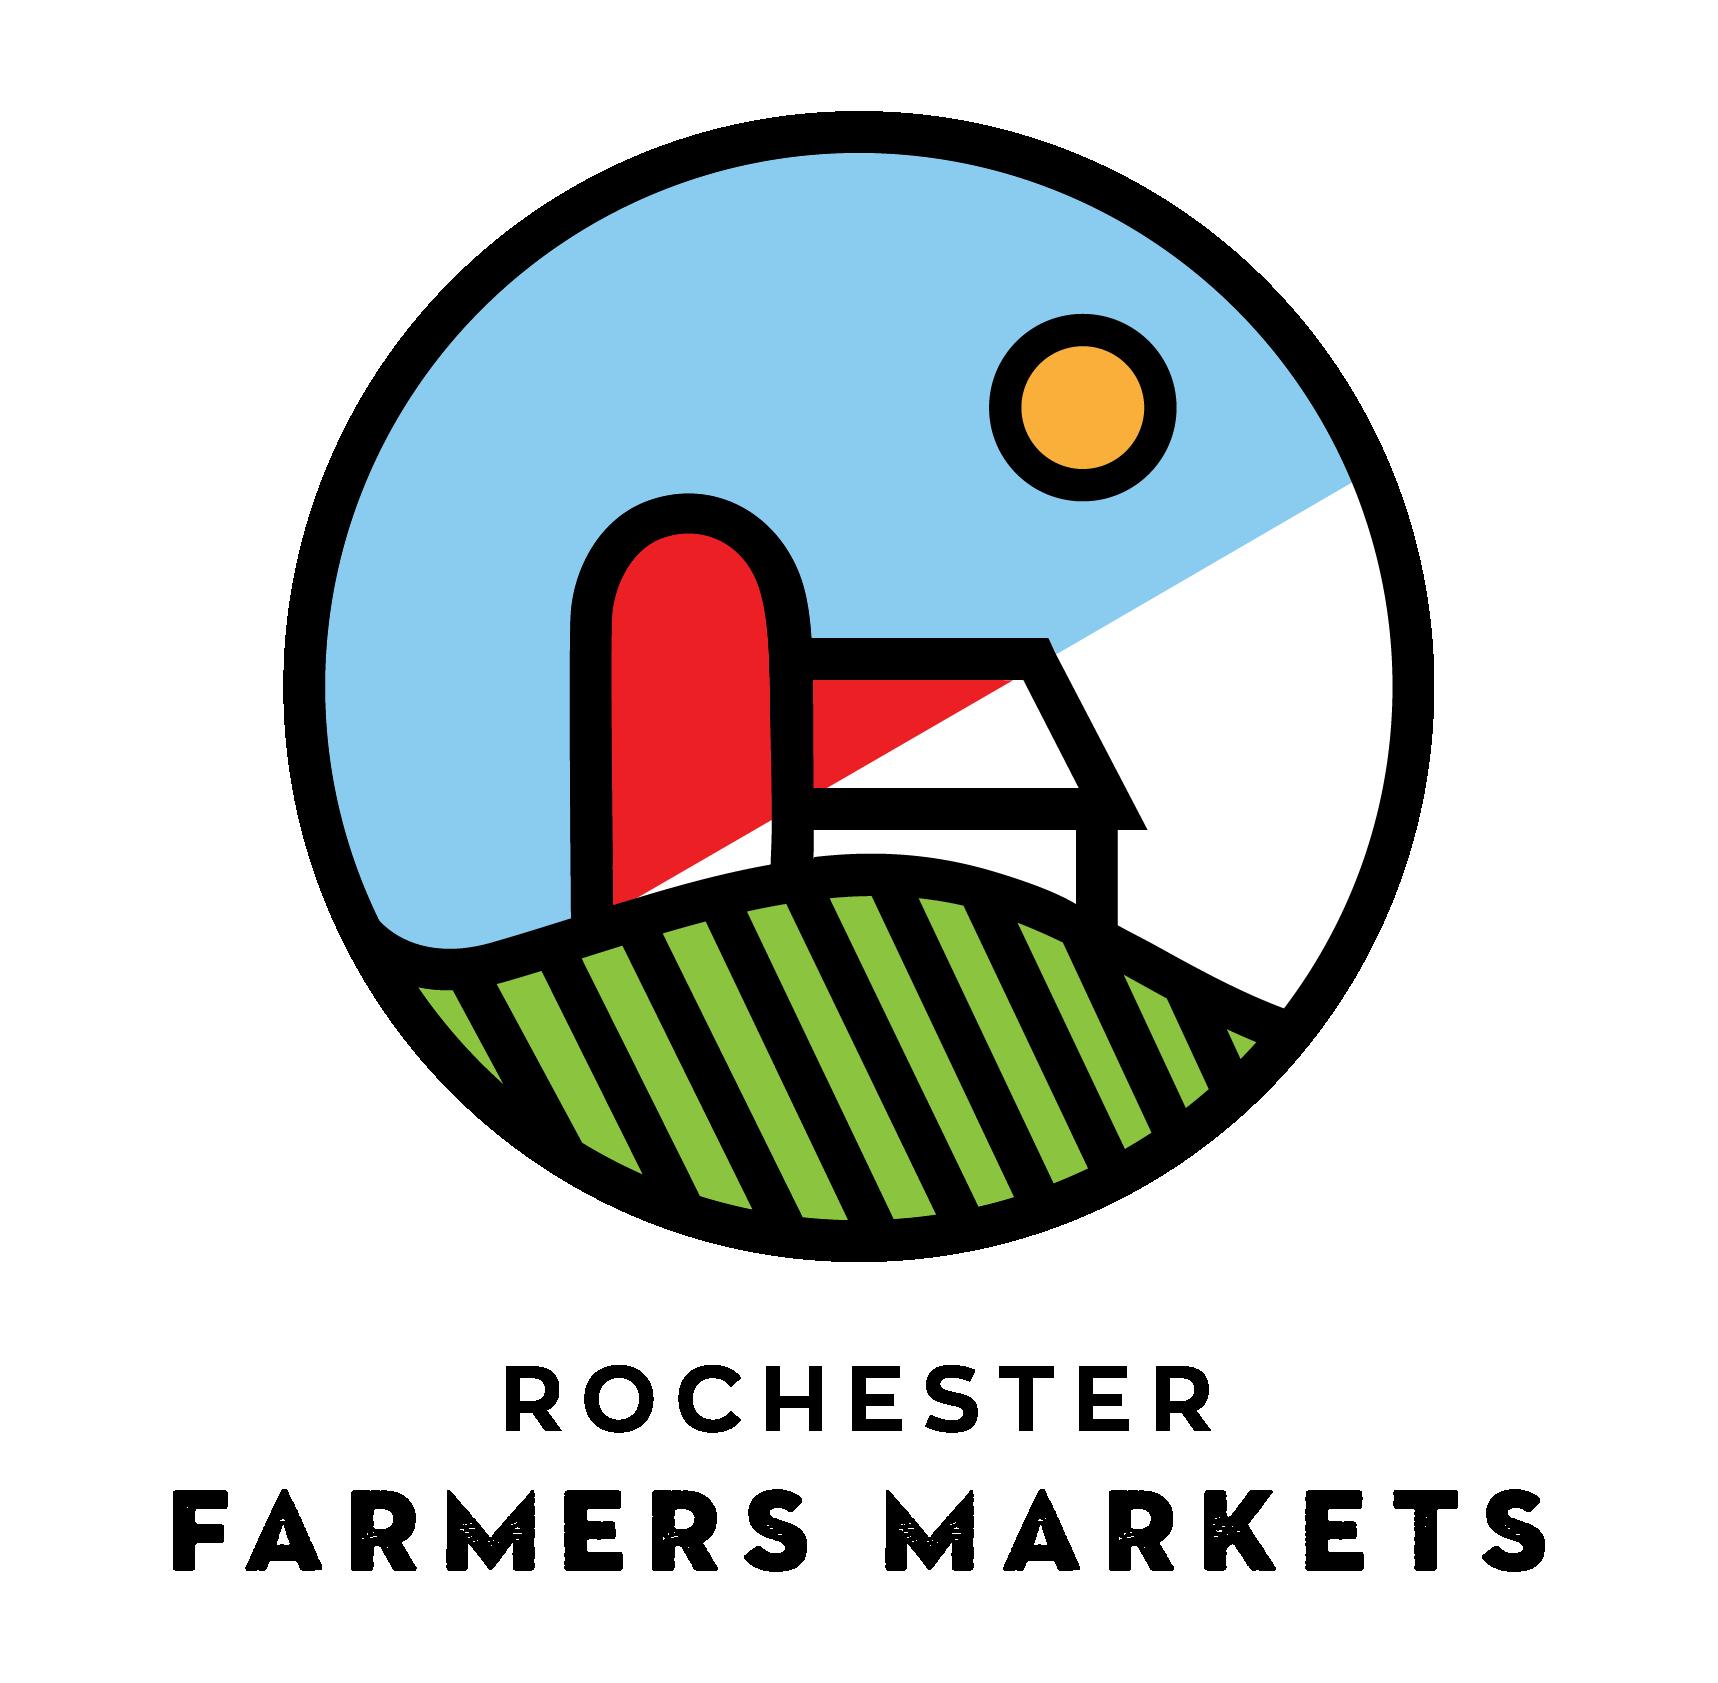 rochester farmers market logo